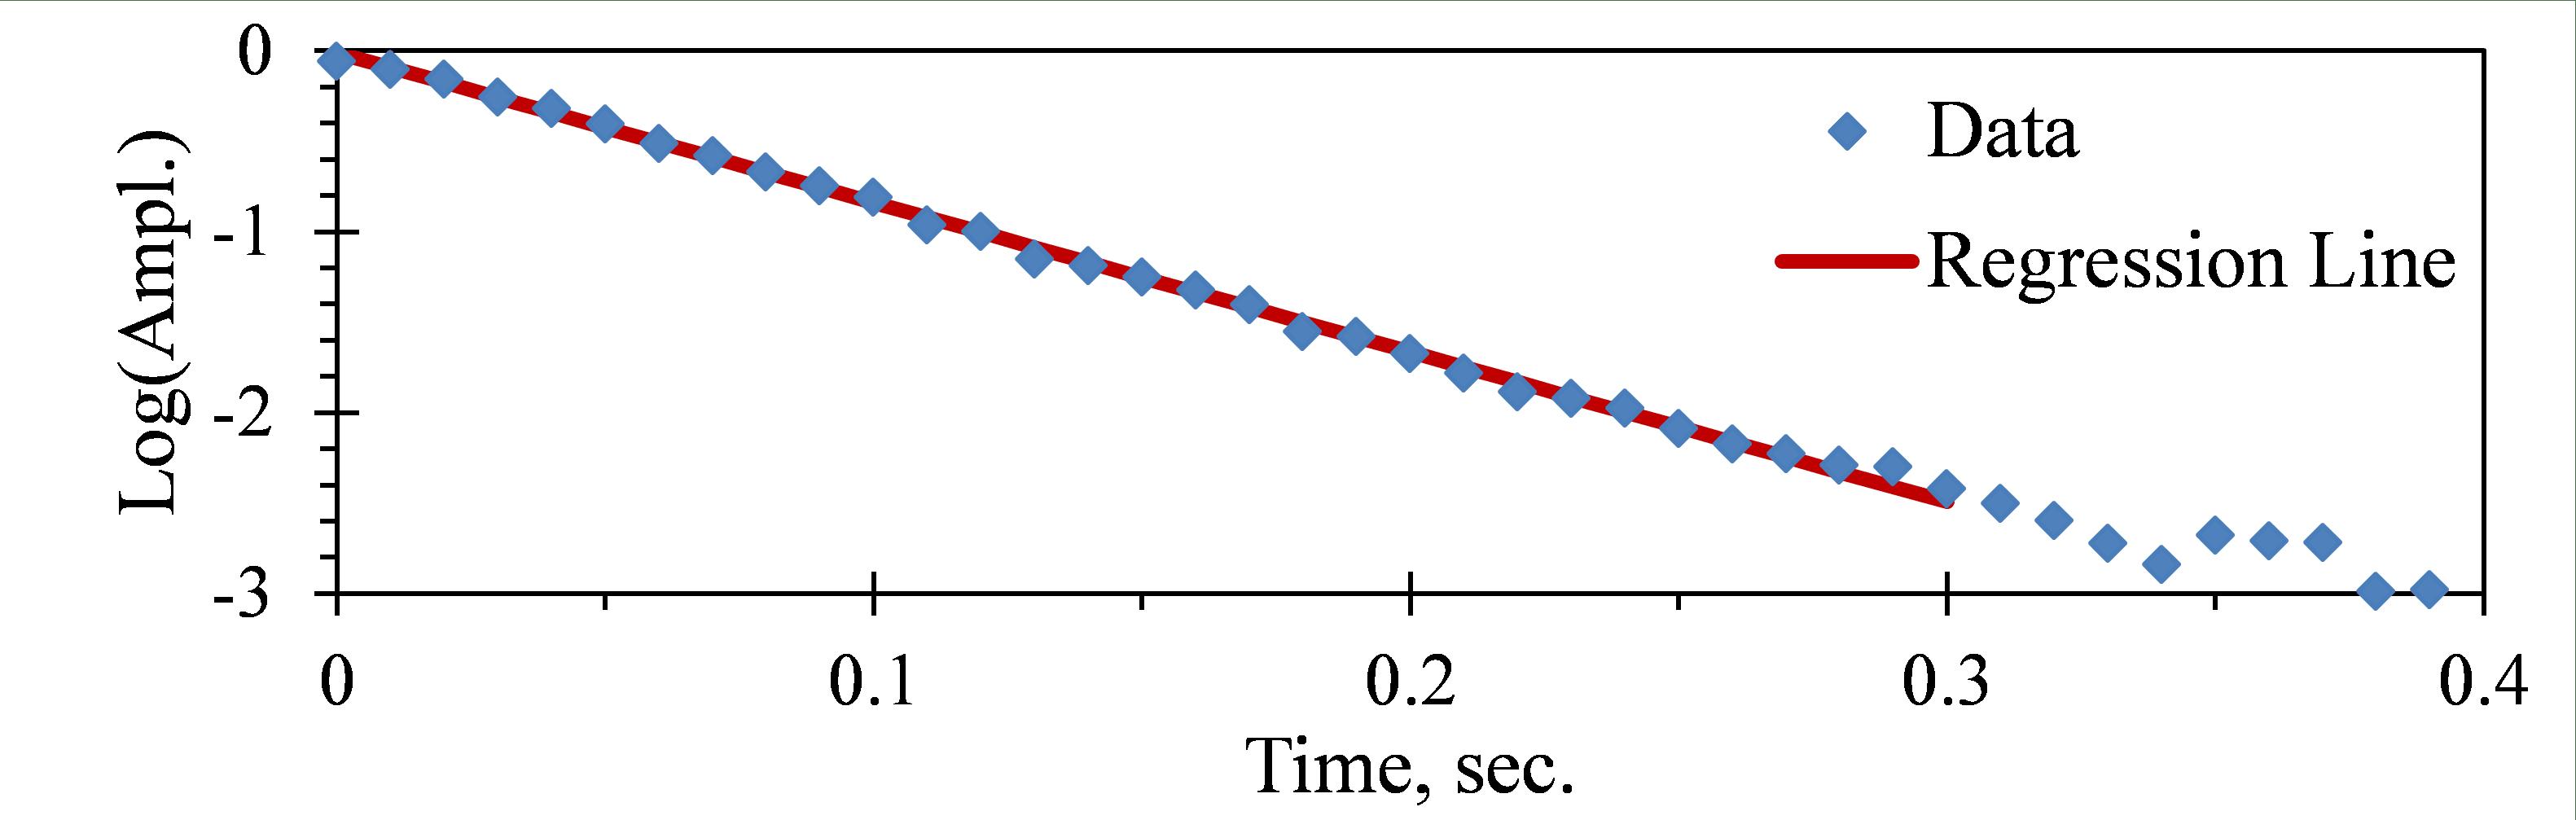 Regression Analysis - Figure 19b